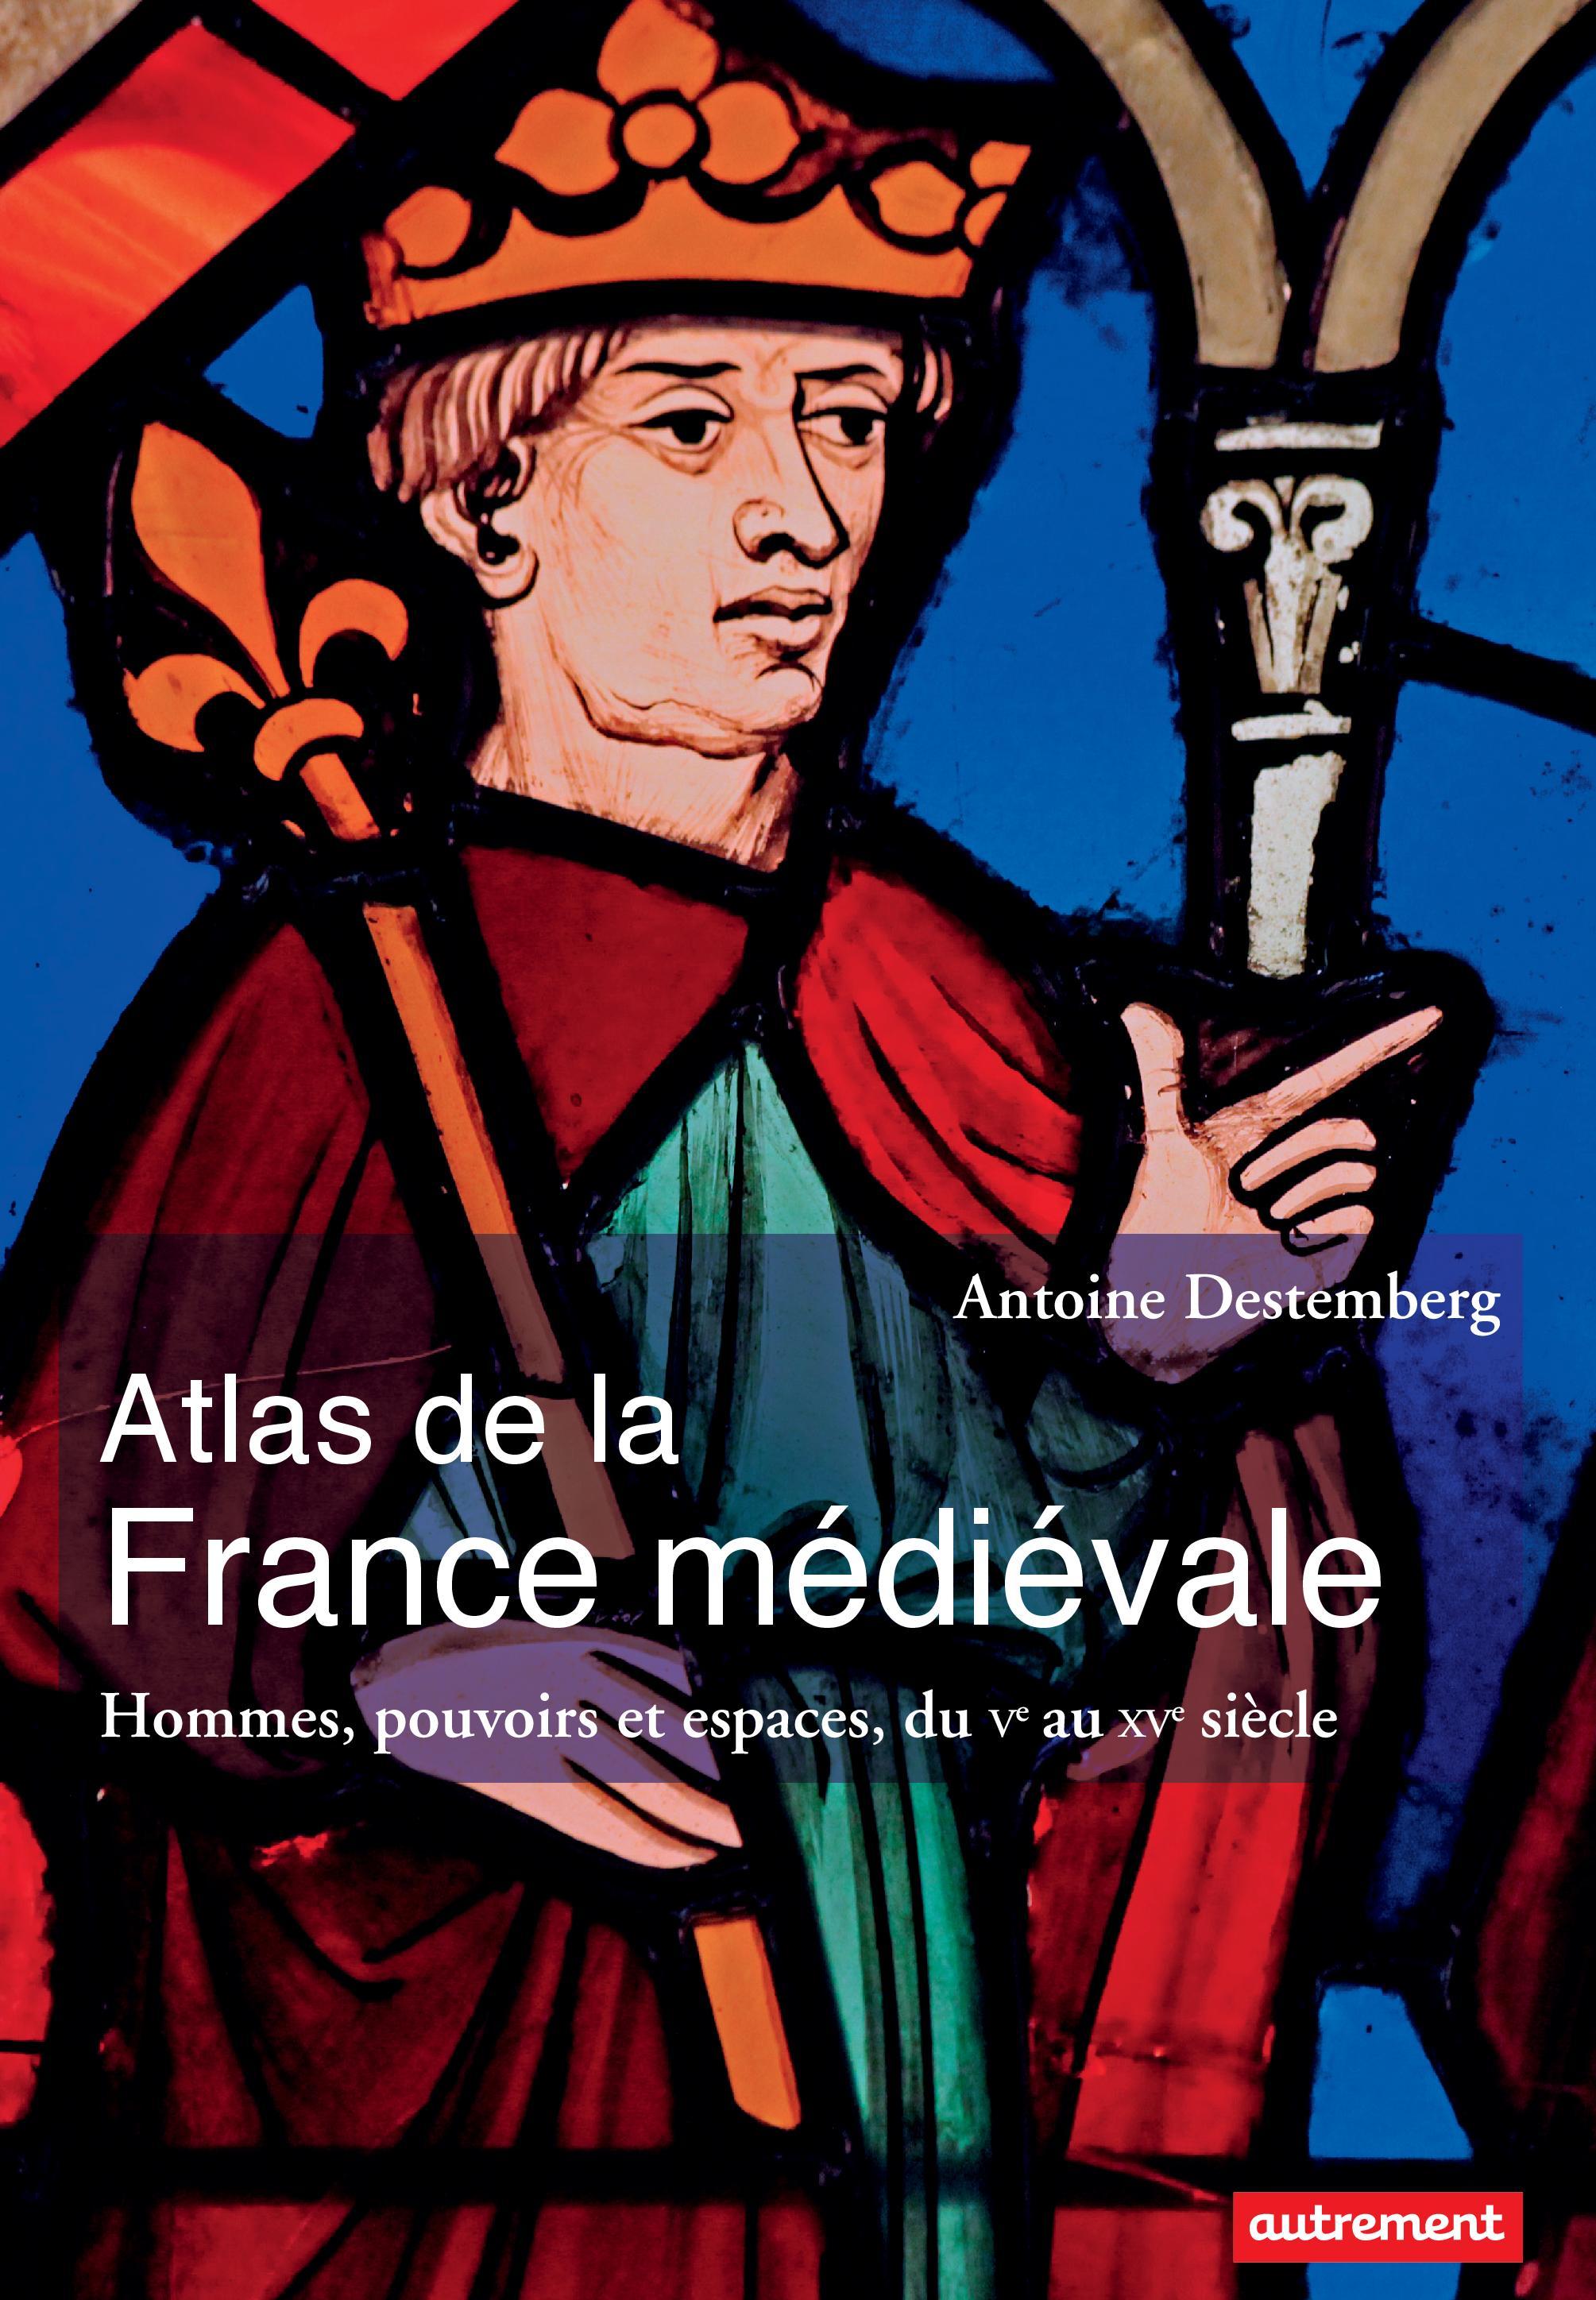 Atlas de la France médiévale